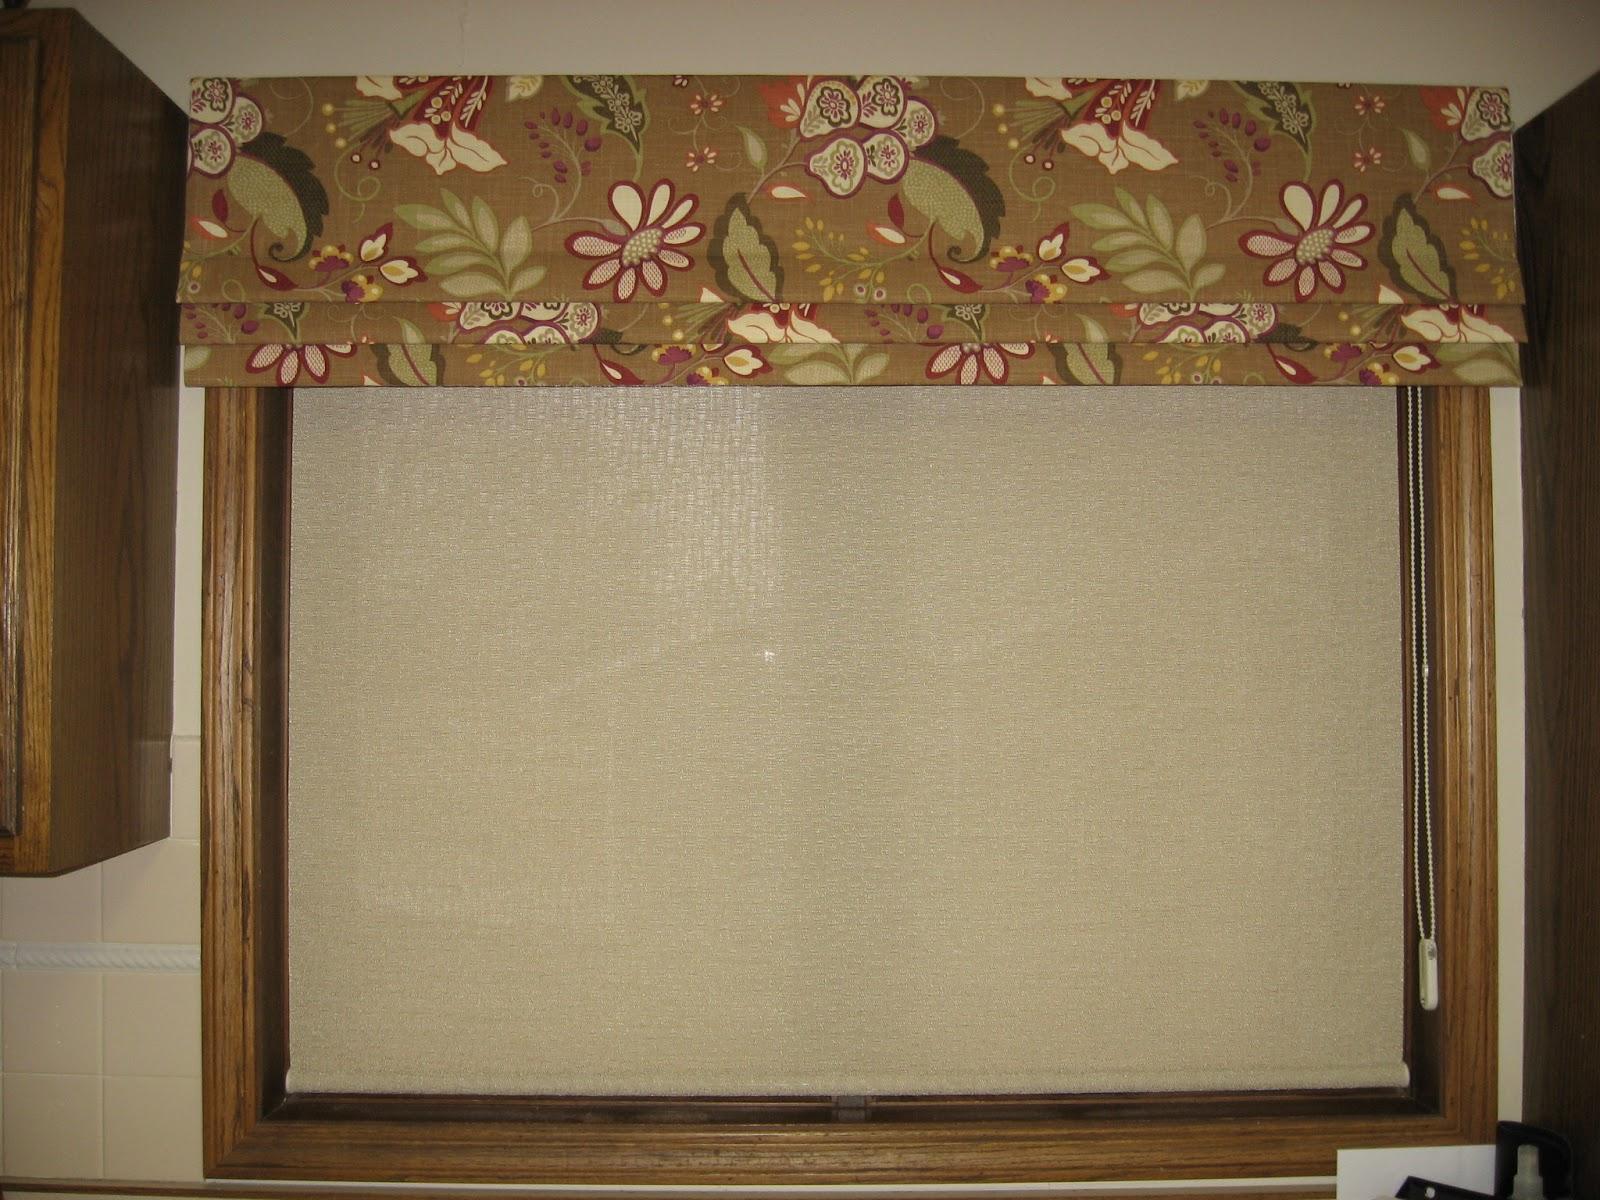 Window Fashions A Simple Roman Shade Valance